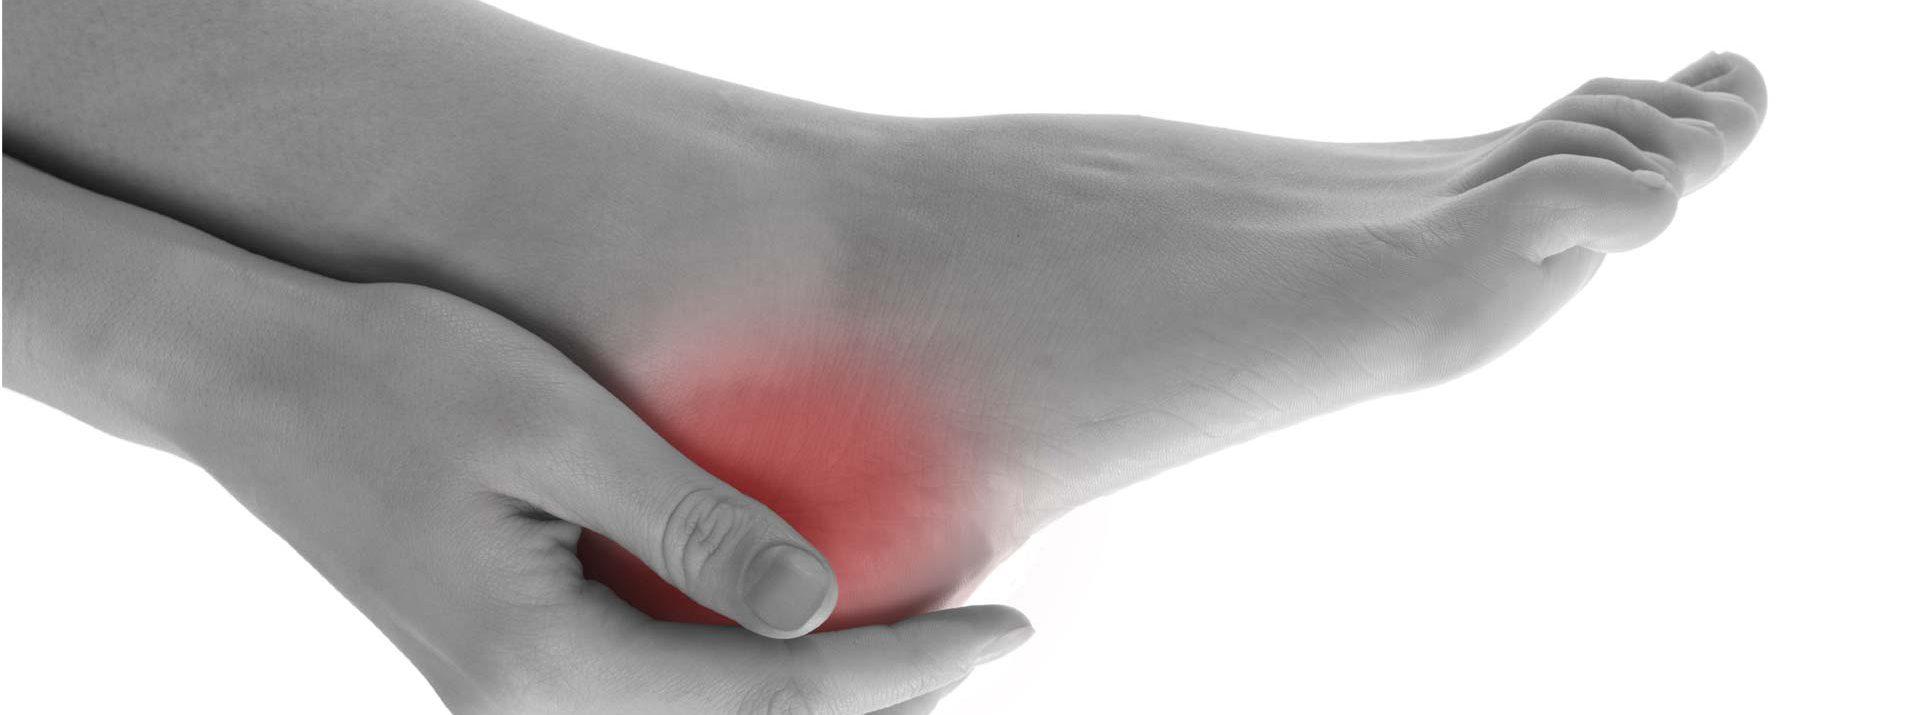 podiatrist hand holding painful heel